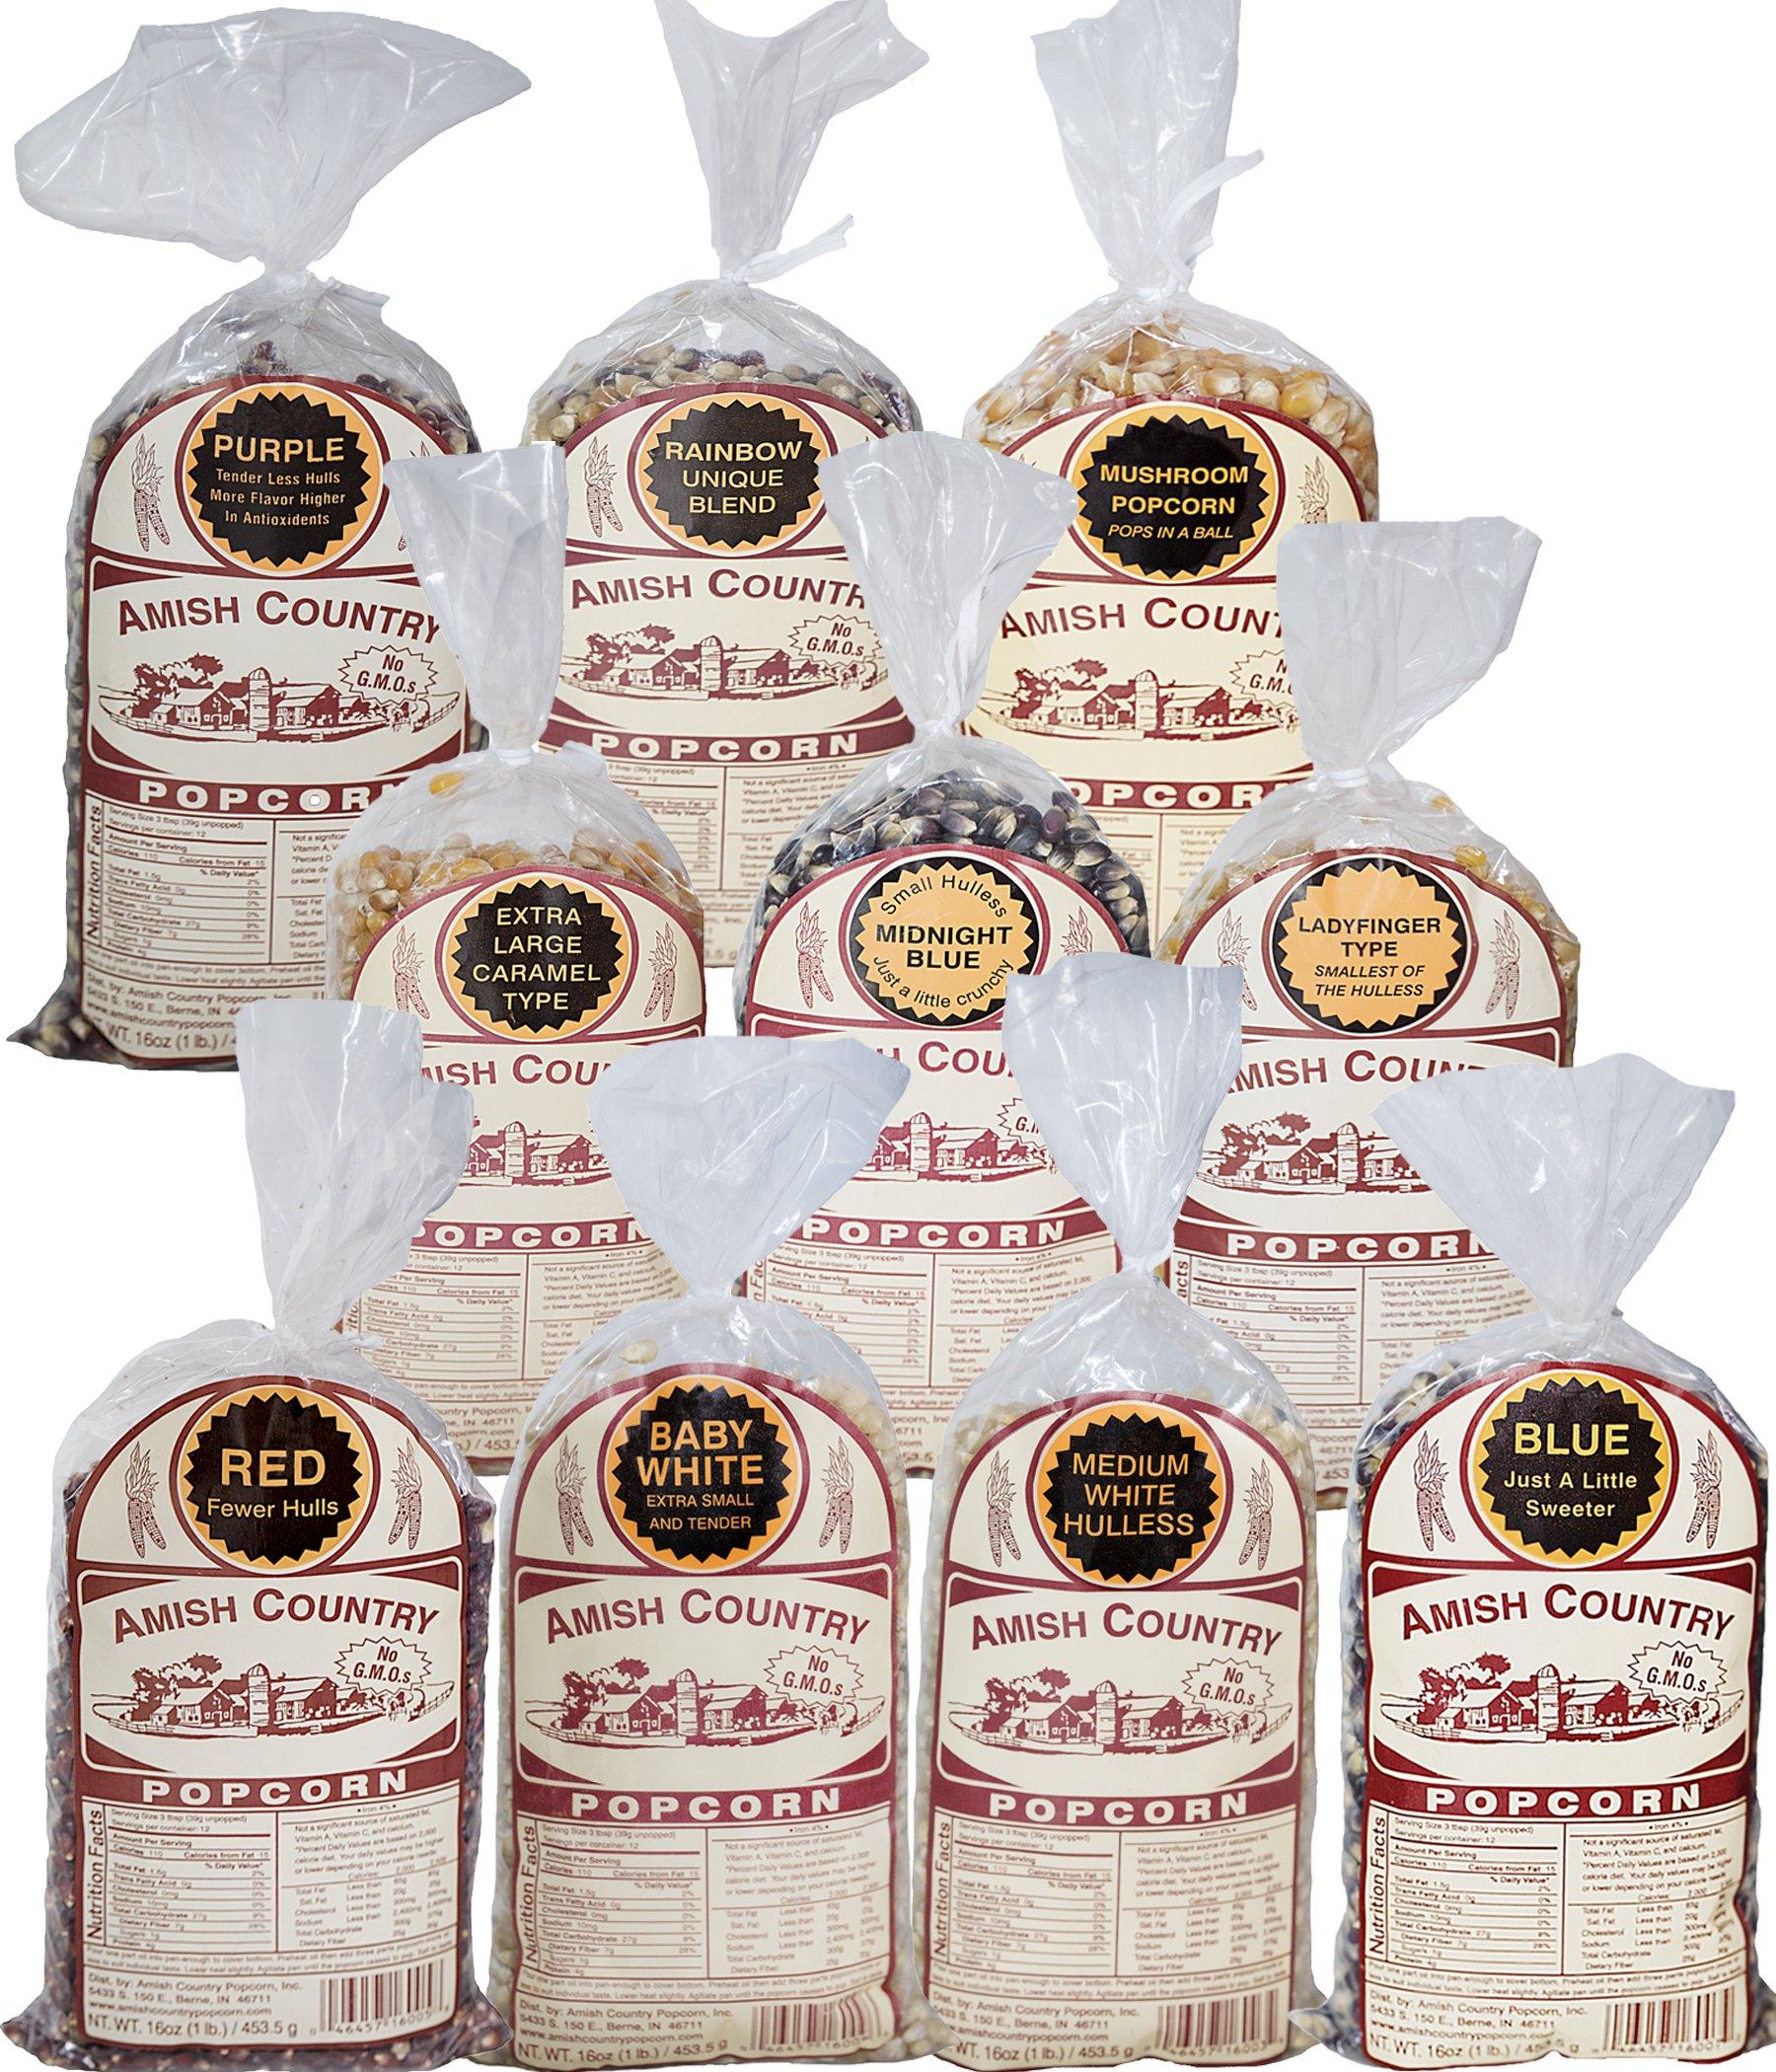 Amish Country Popcorn - 10 (1 Lb Bag) Variety Bundle with Recipe Guide (Red, Blue, Medium White, Midnight Blue, Purple, Ladyfinger, Baby White, Rainbow, Extra Large Caramel Type, and Mushroom)